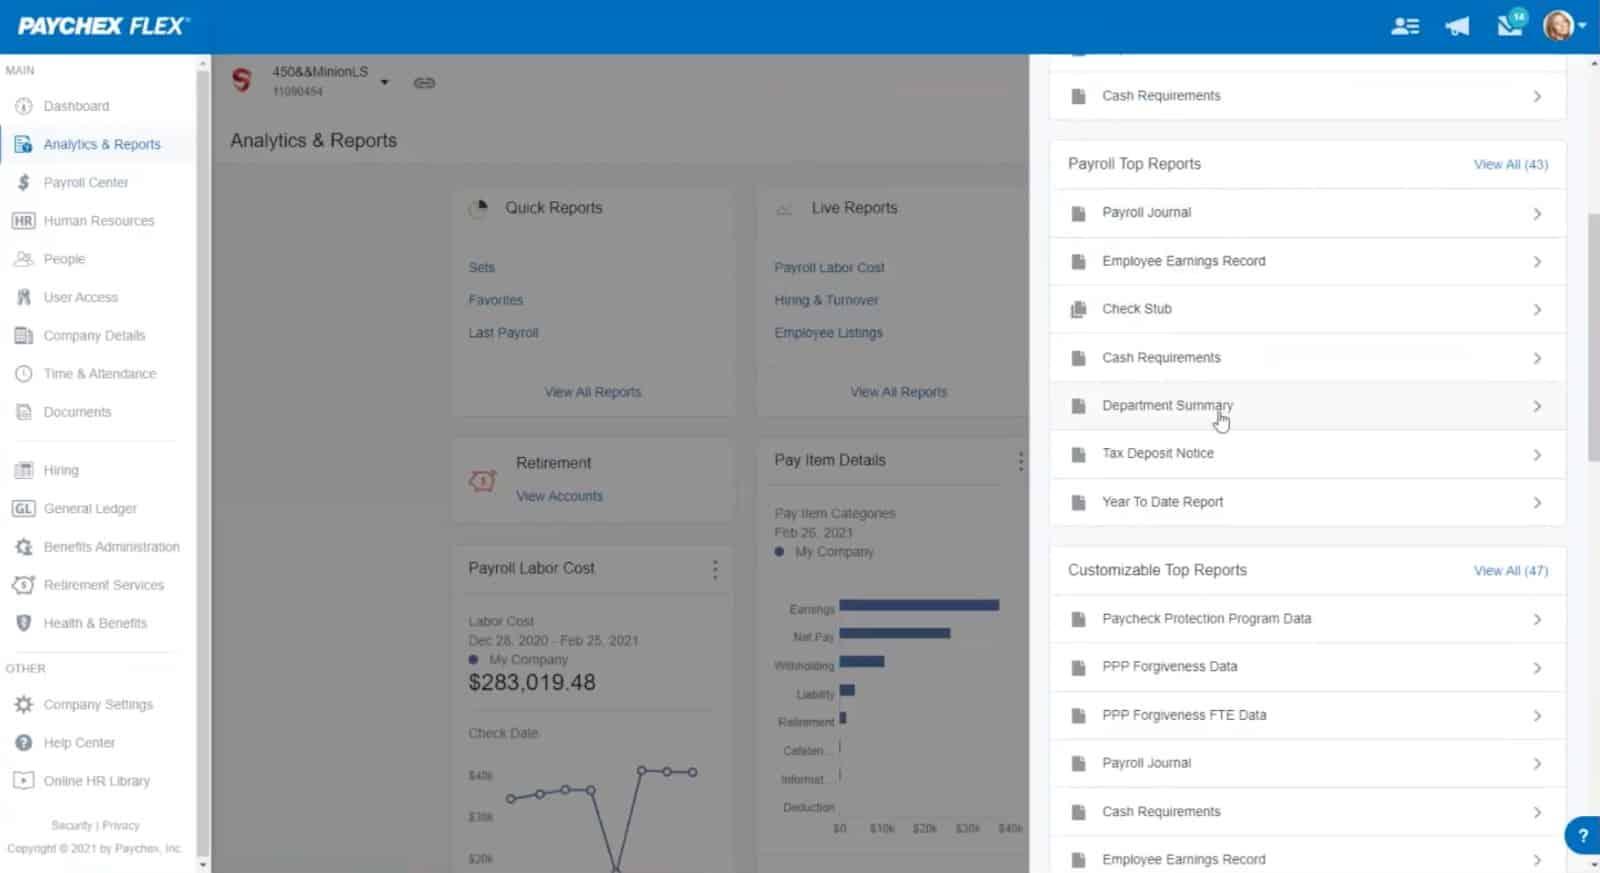 Screenshot of Paychex Flex Analytics and Reports